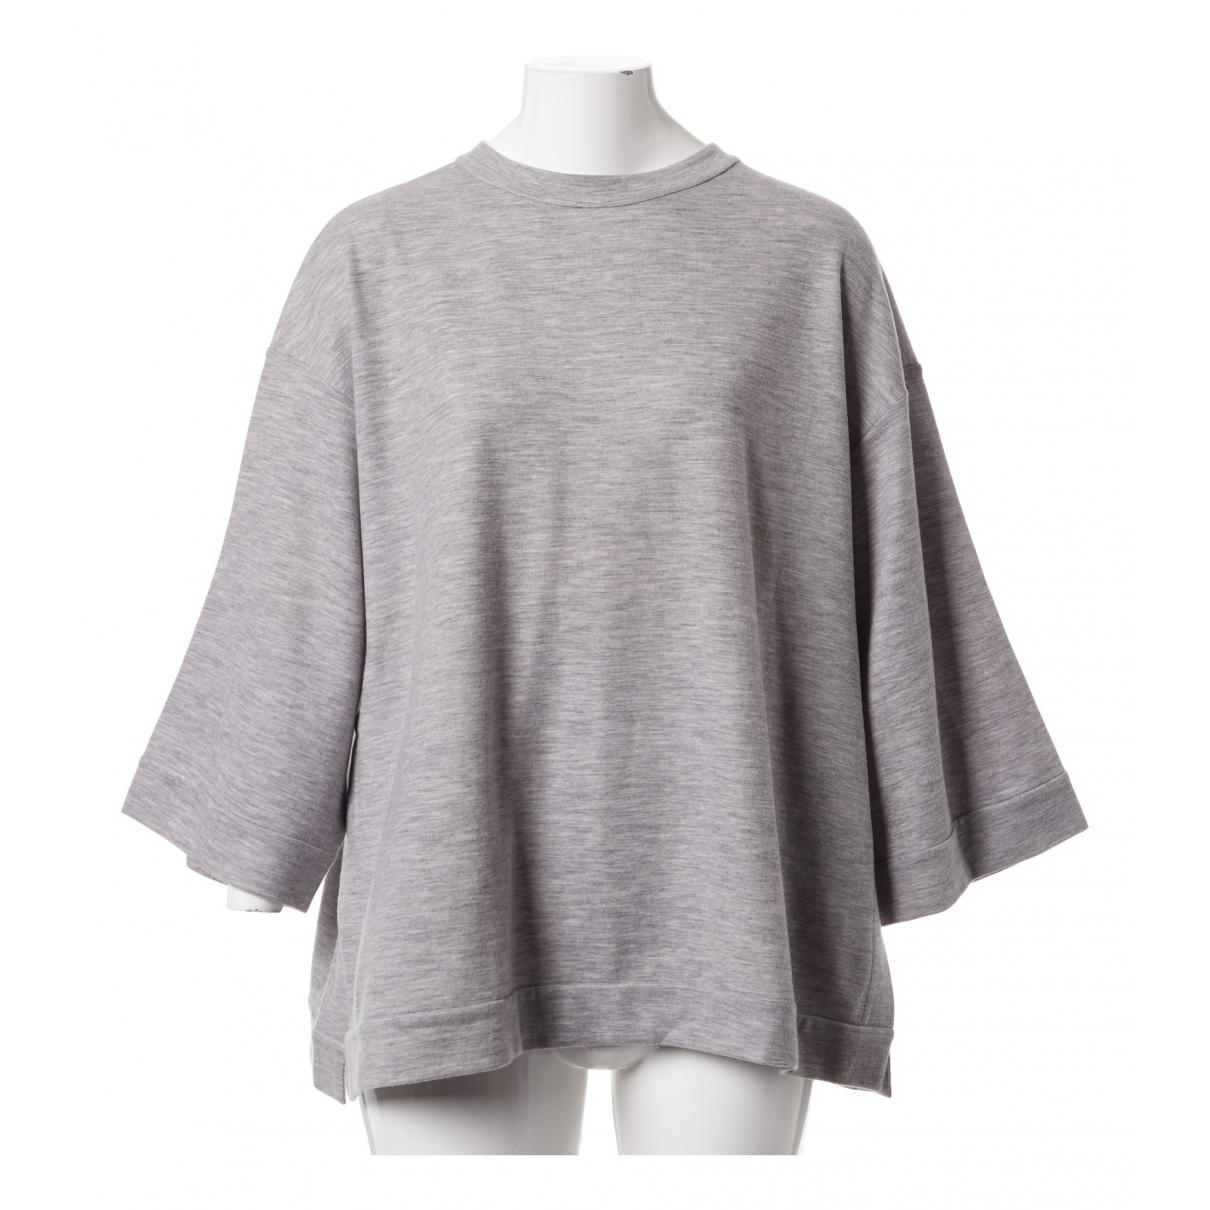 Brunello Cucinelli \N Grey Cashmere Knitwear for Women L International